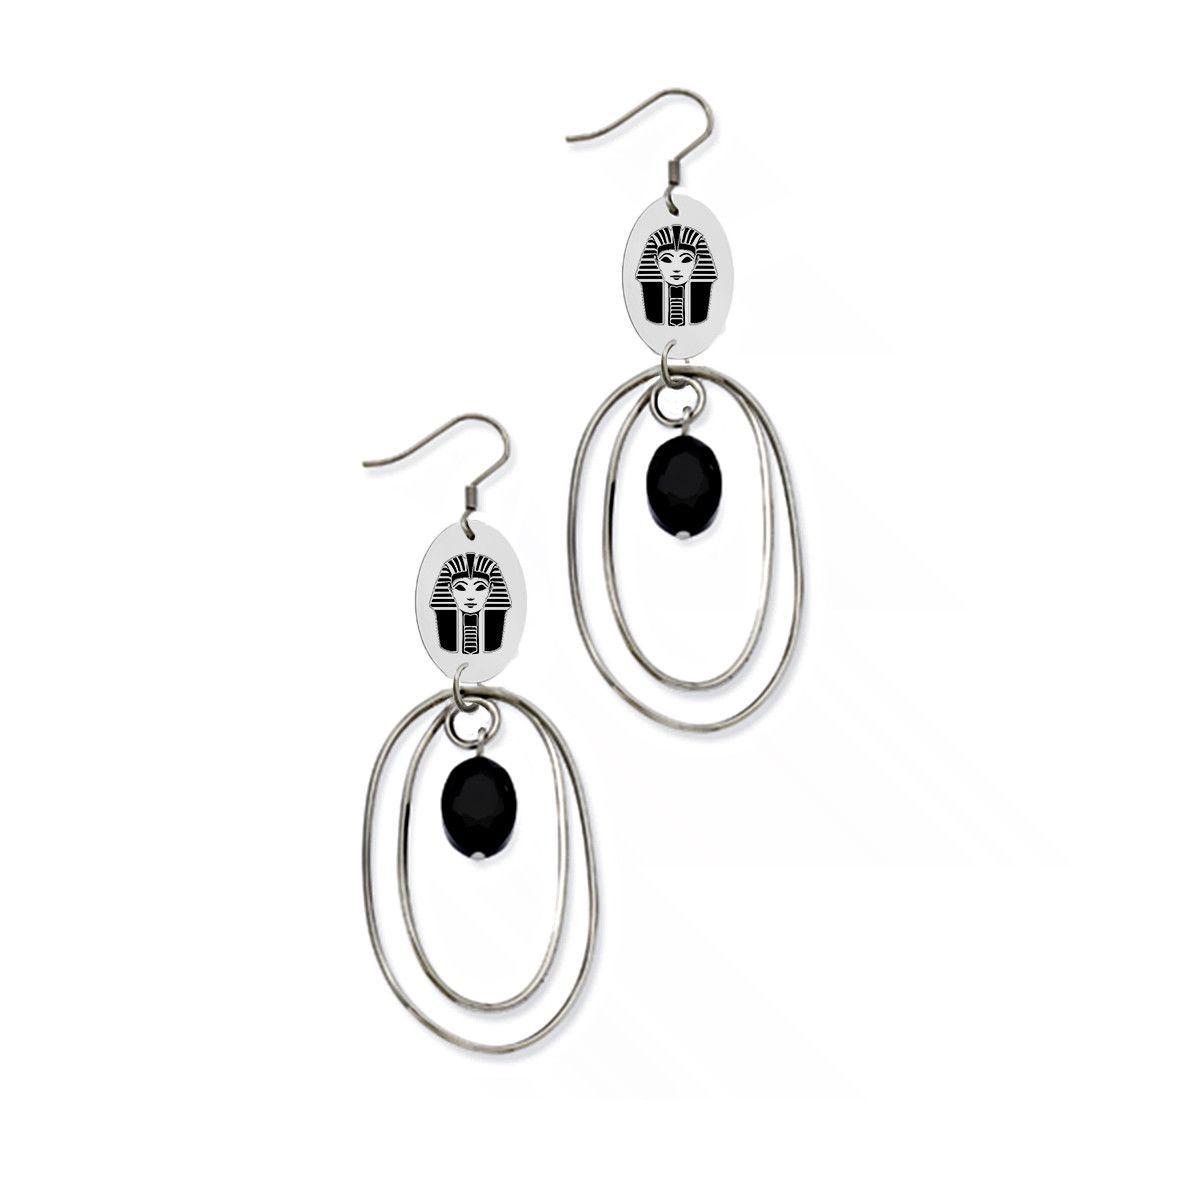 Phi sigma sigma symbol stainless steel loop earrings shepherds phi sigma sigma symbol stainless steel loop earrings buycottarizona Gallery